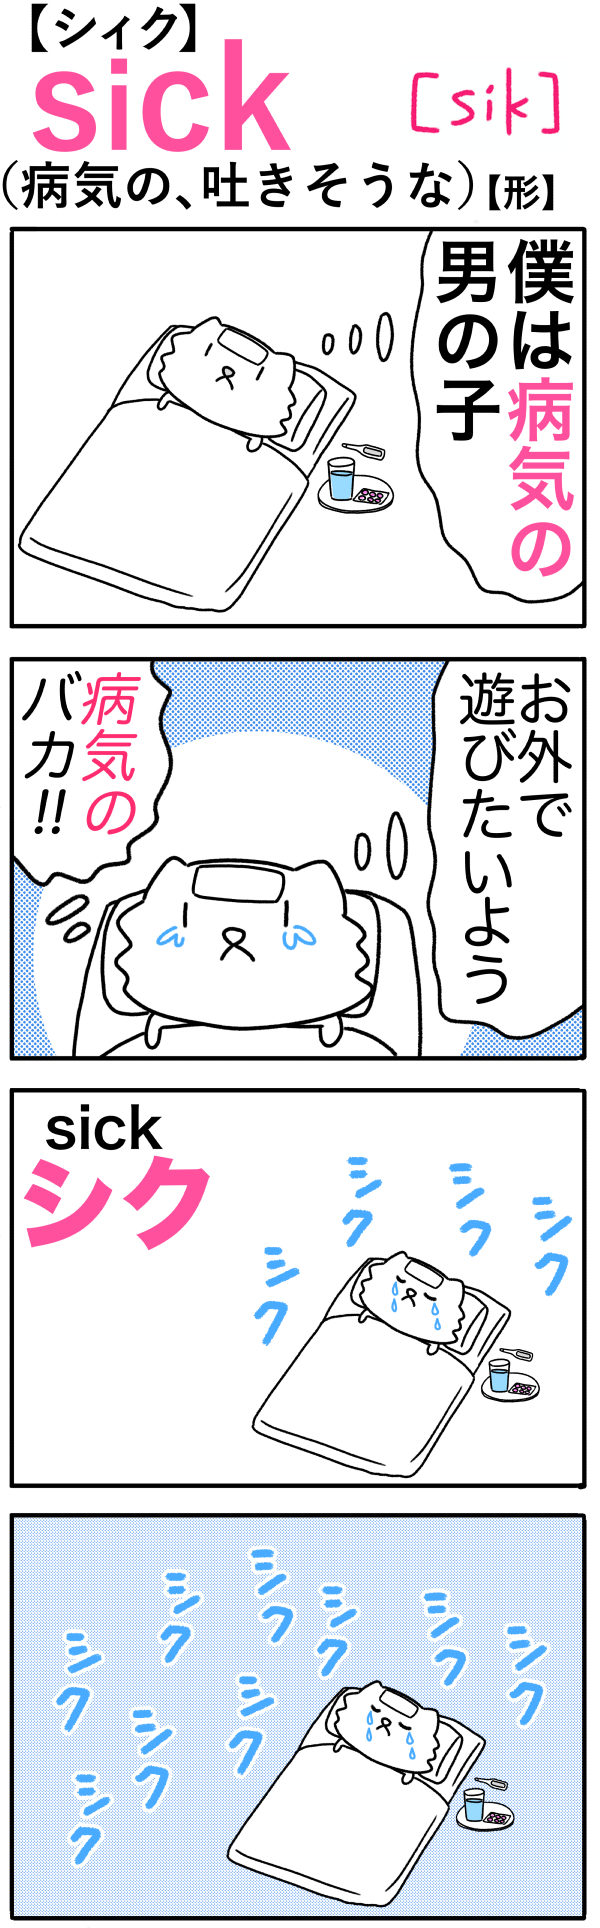 sick(病気の、吐きそうな)